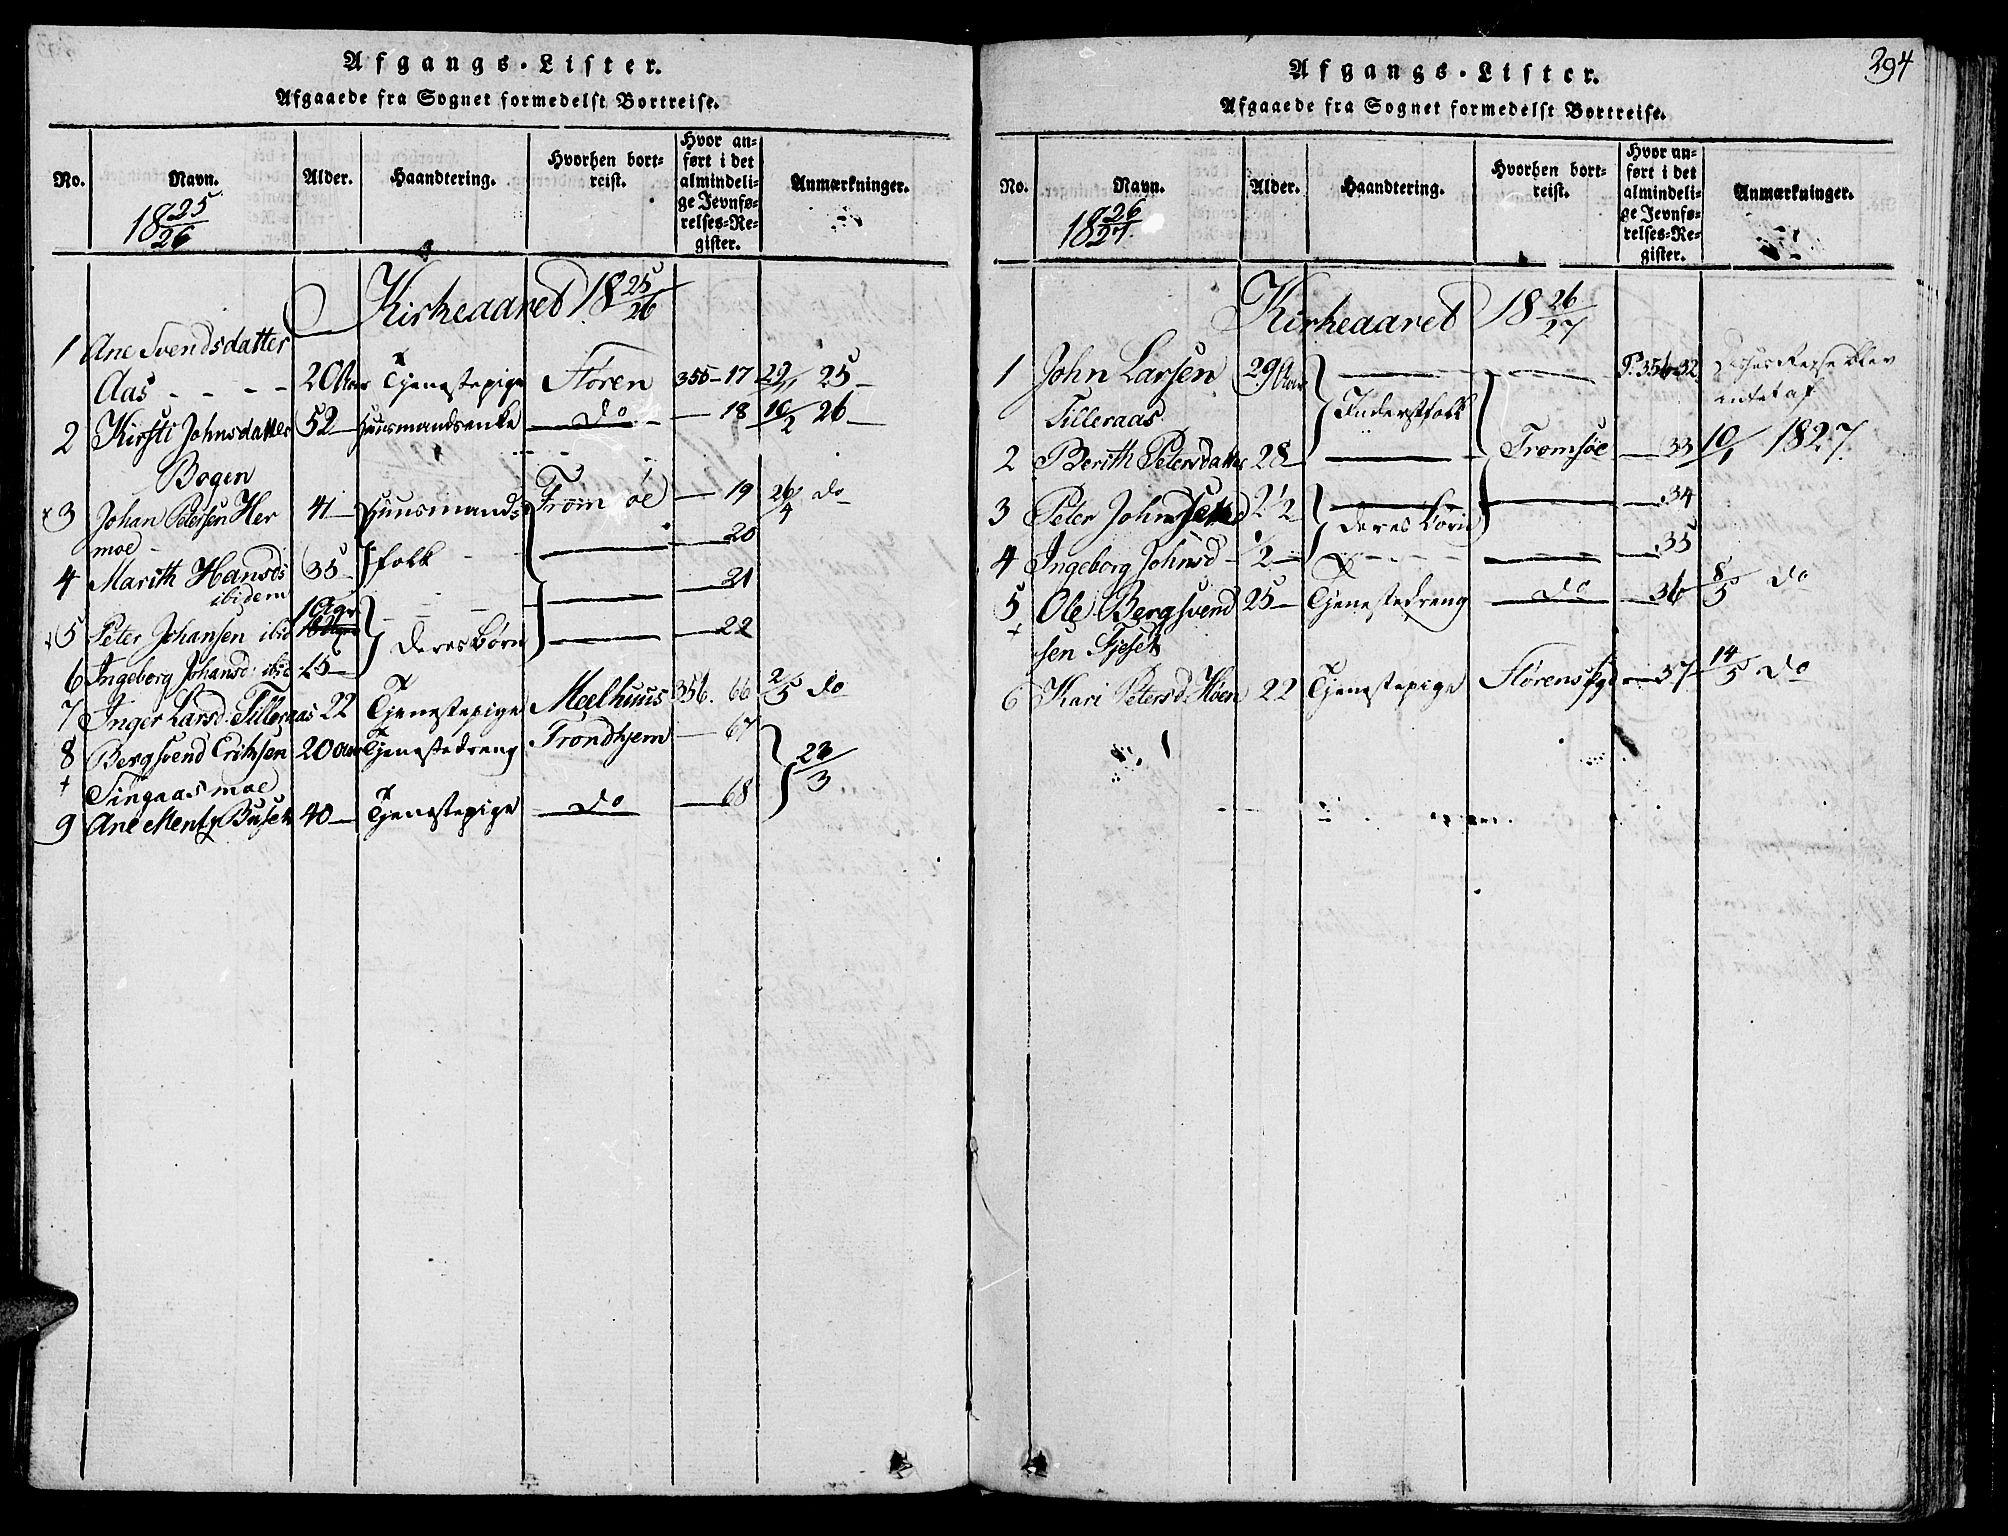 SAT, Ministerialprotokoller, klokkerbøker og fødselsregistre - Sør-Trøndelag, 685/L0955: Parish register (official) no. 685A03 /2, 1817-1829, p. 294